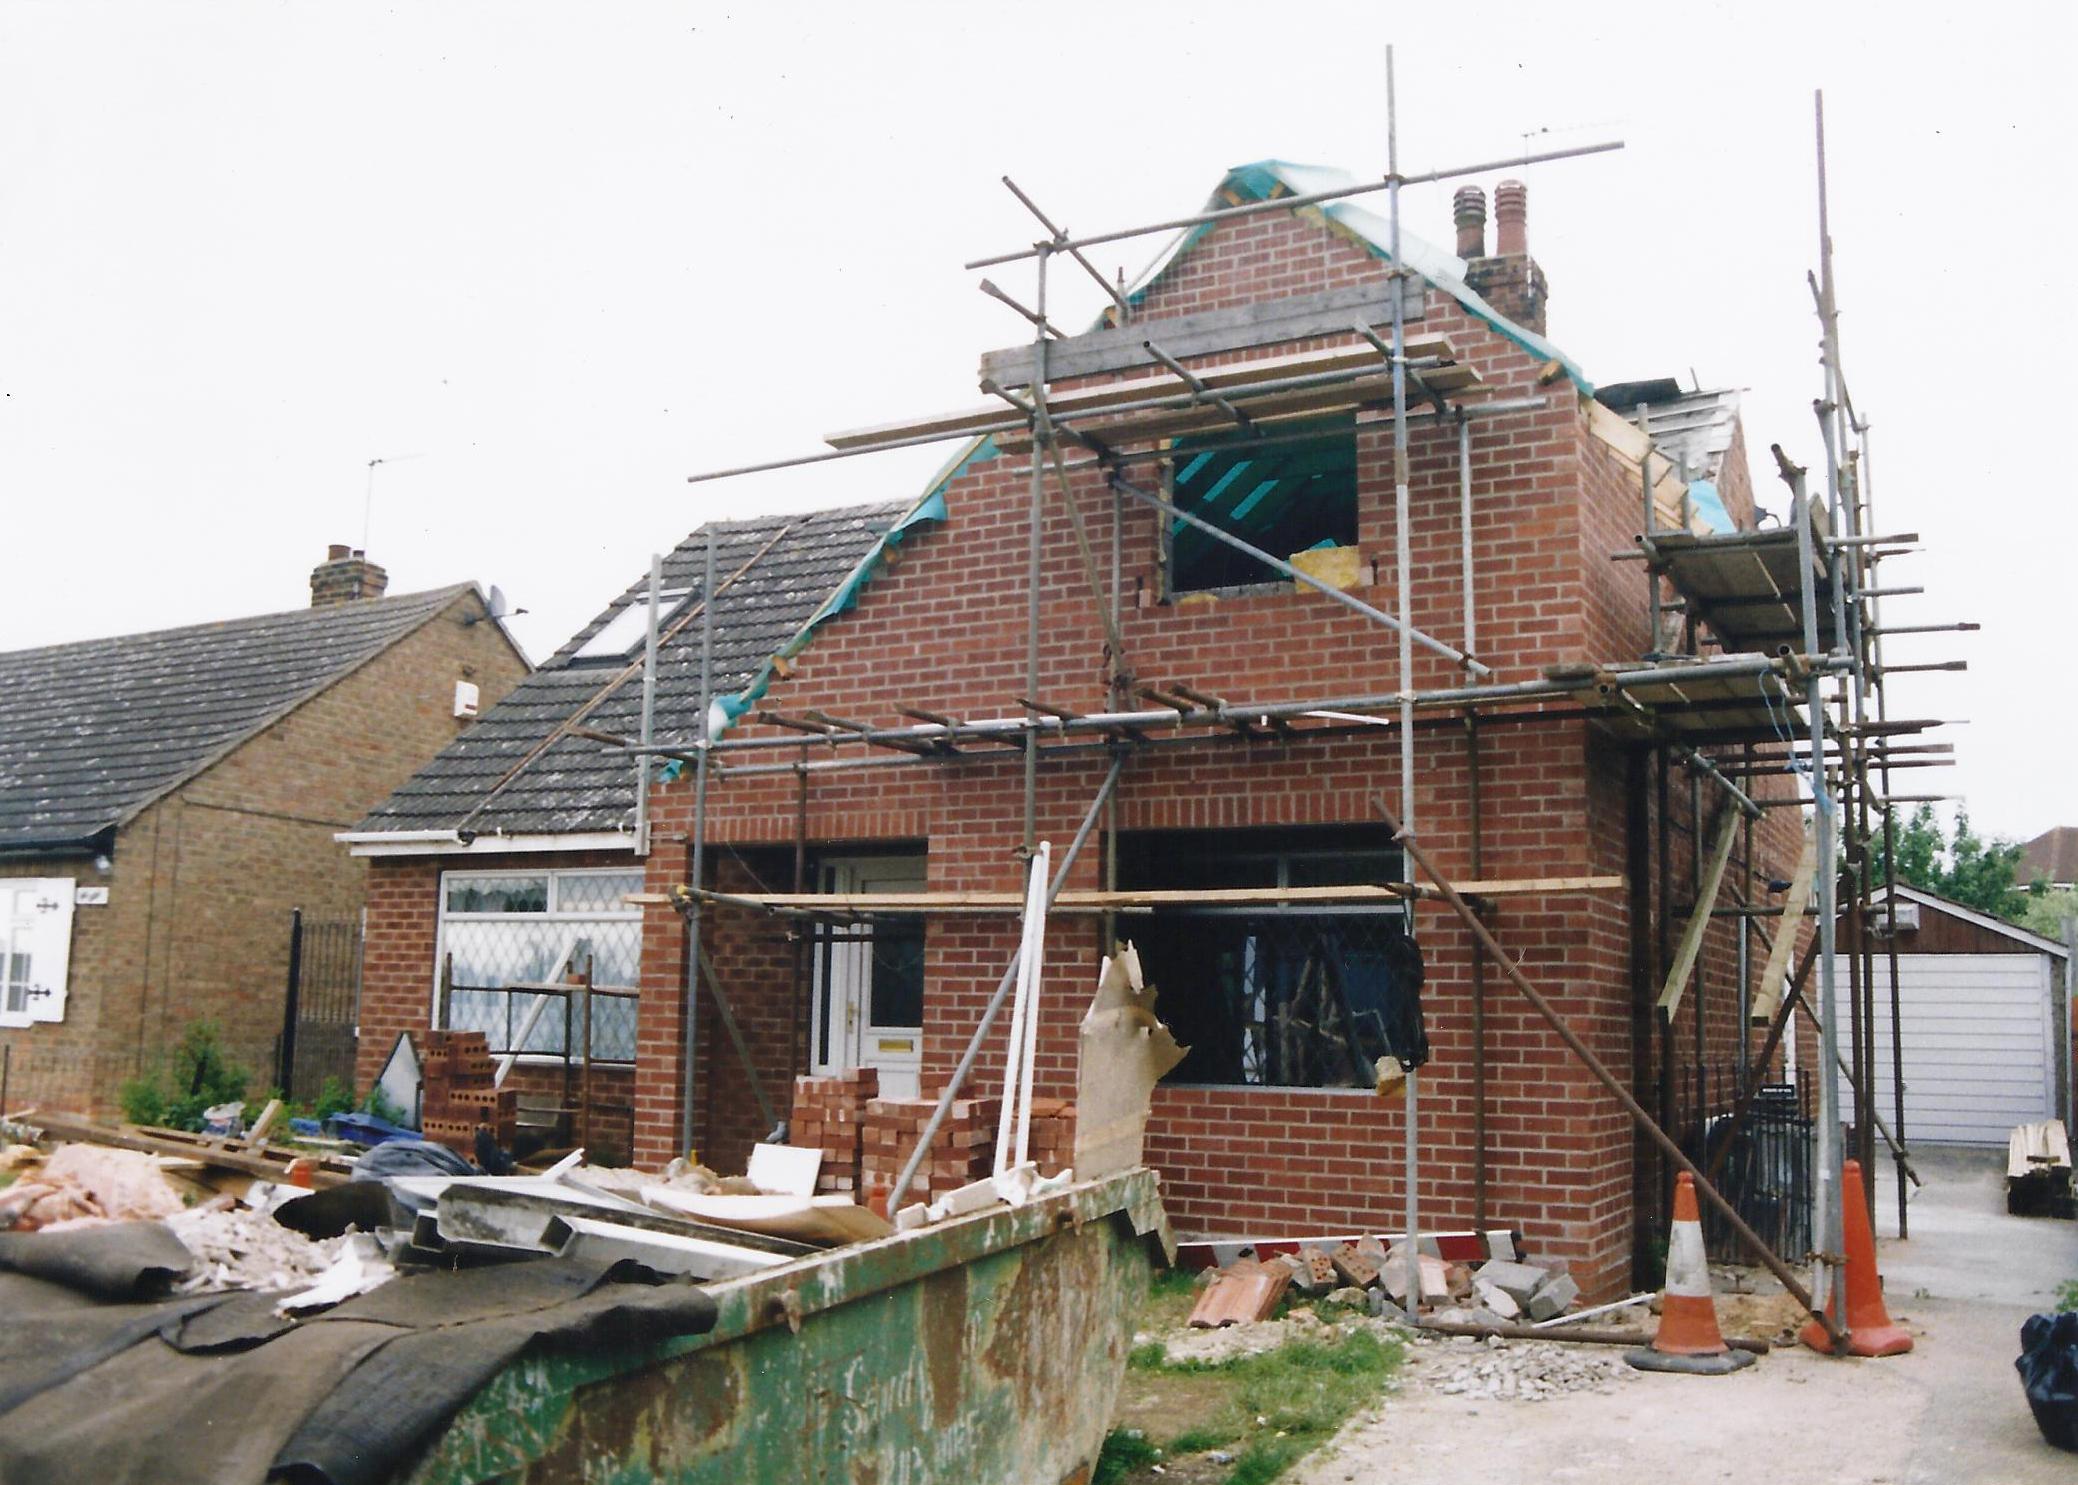 Construction 3 - Sproatley Cottage - East Yorkshire Architects - Samuel Kendall Associates.jpg.jpg